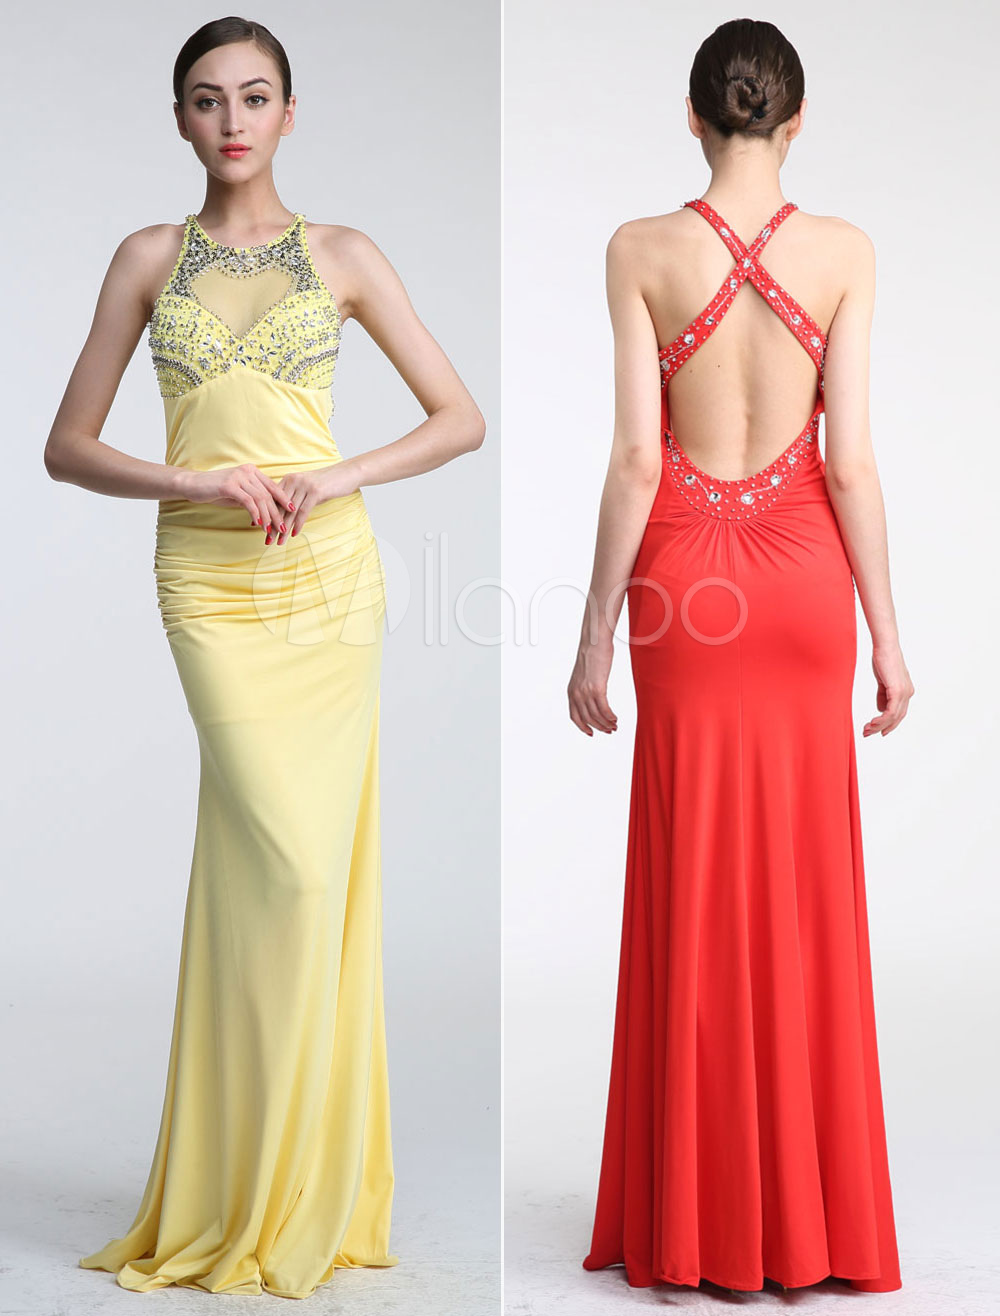 Beaded Illusion Halter Neckline Mermaid Prom Dress with Crisscross Back